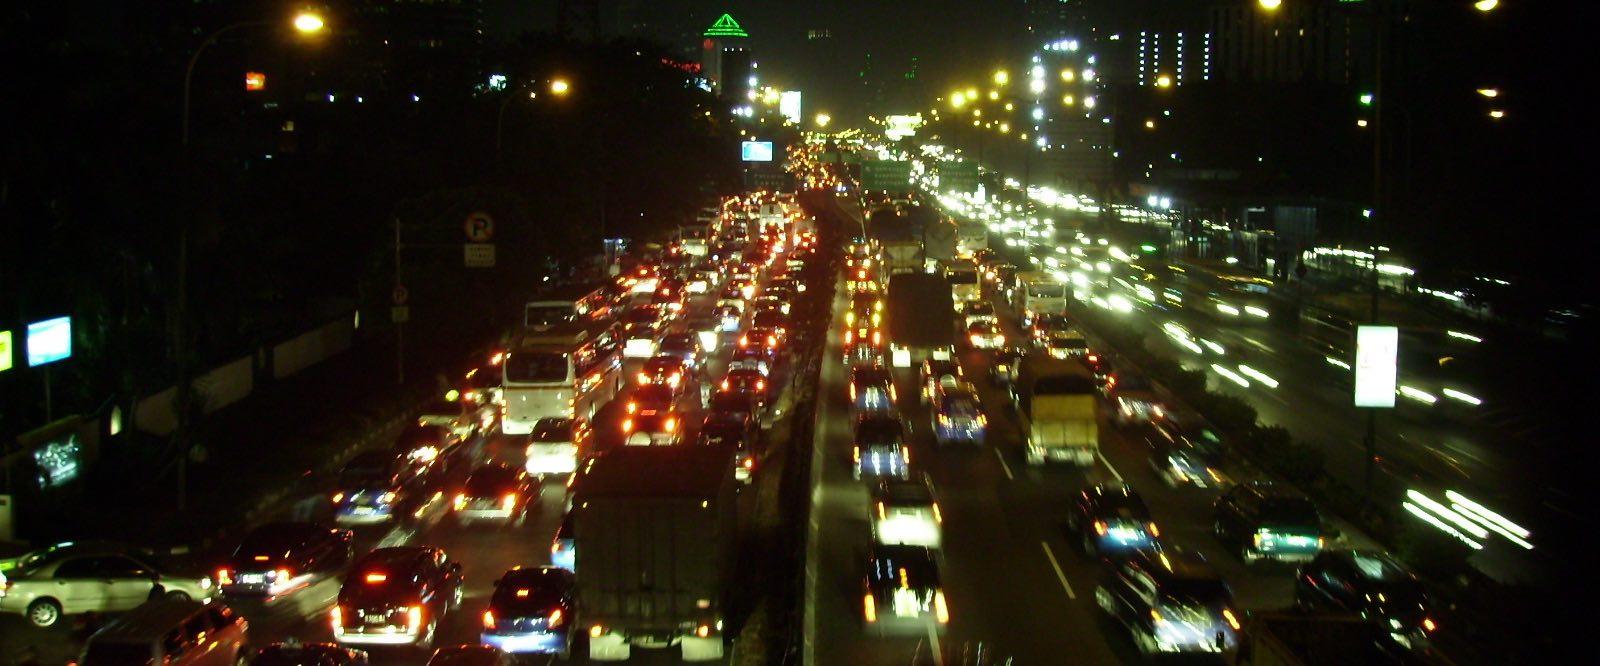 Traffic flows, Jakarta (Photo: basibanget/Flickr)